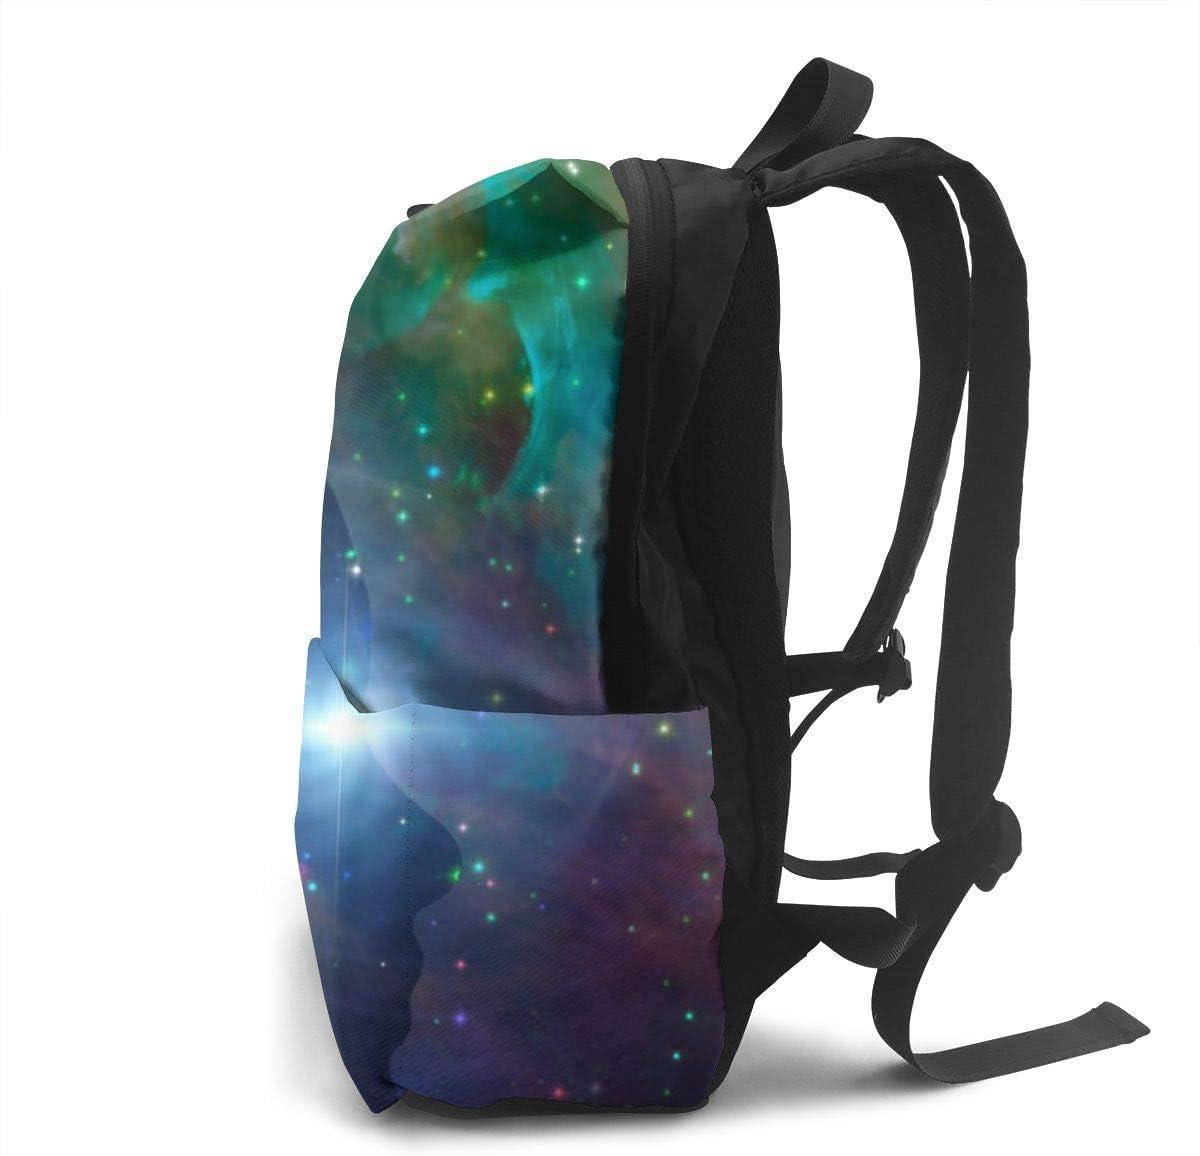 Travel Storage Packet Yin Yang 3D Rendering Travel Bag ,Multifunction Travel Accessories,School Backpack Tote Bag